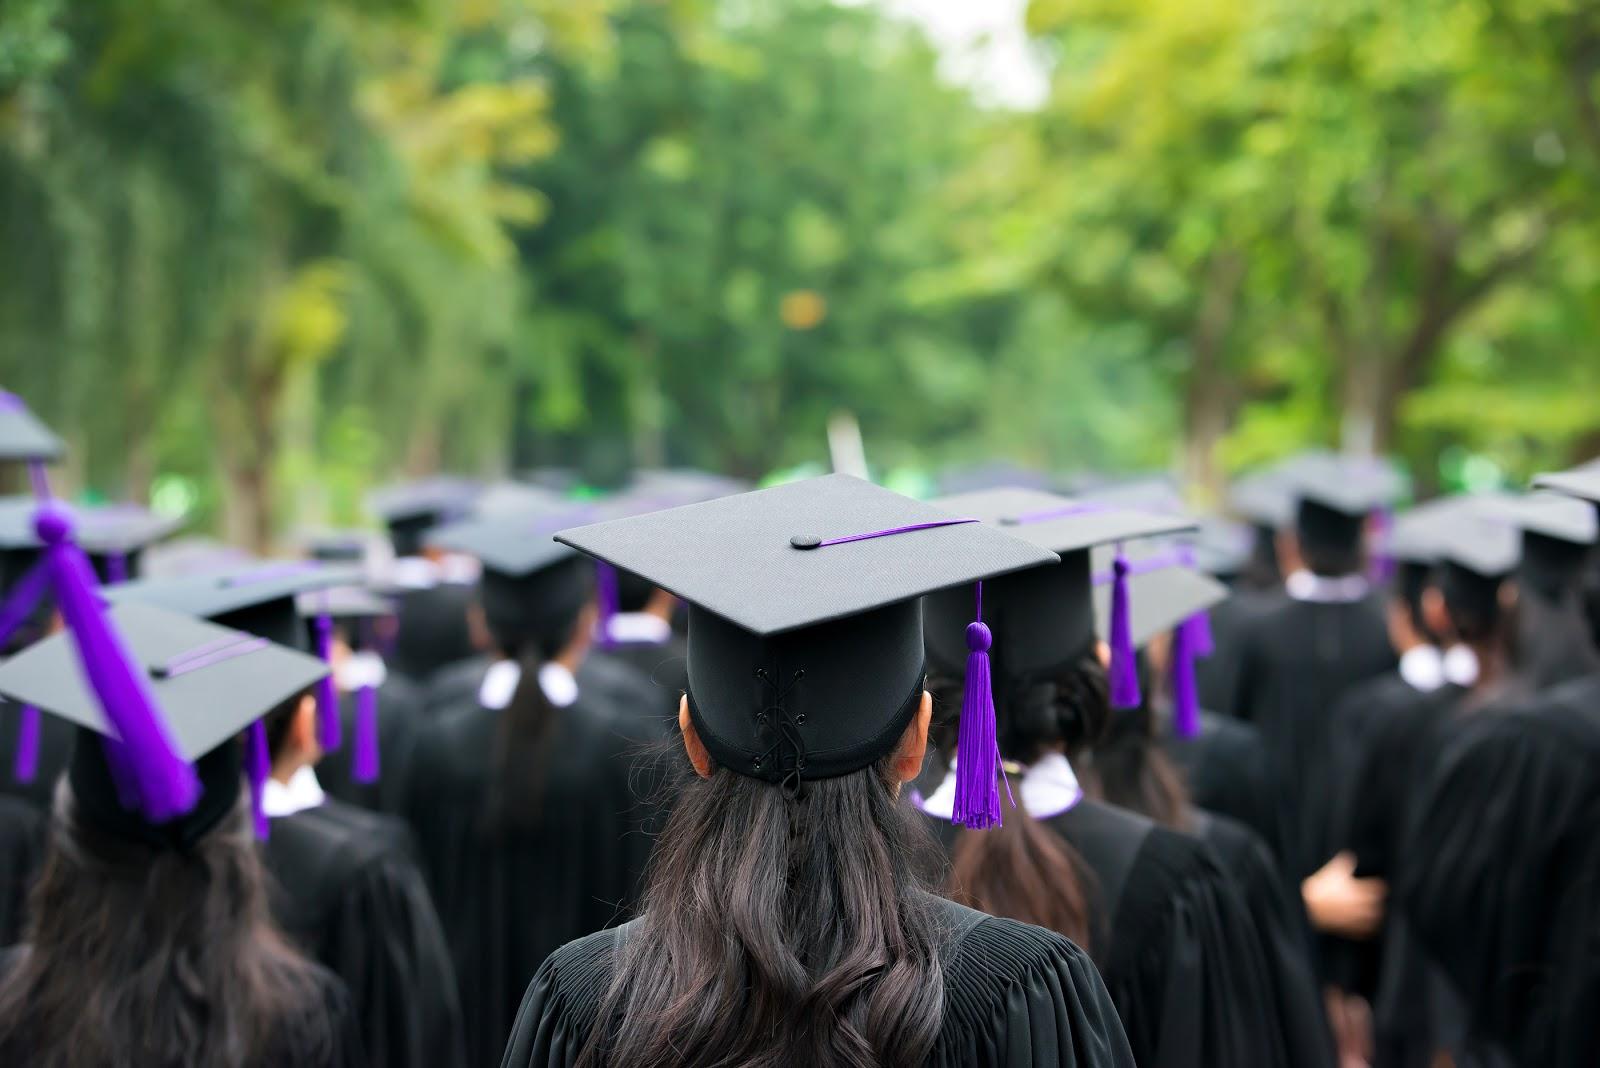 asphalt maintenance universities and college campus Maryland